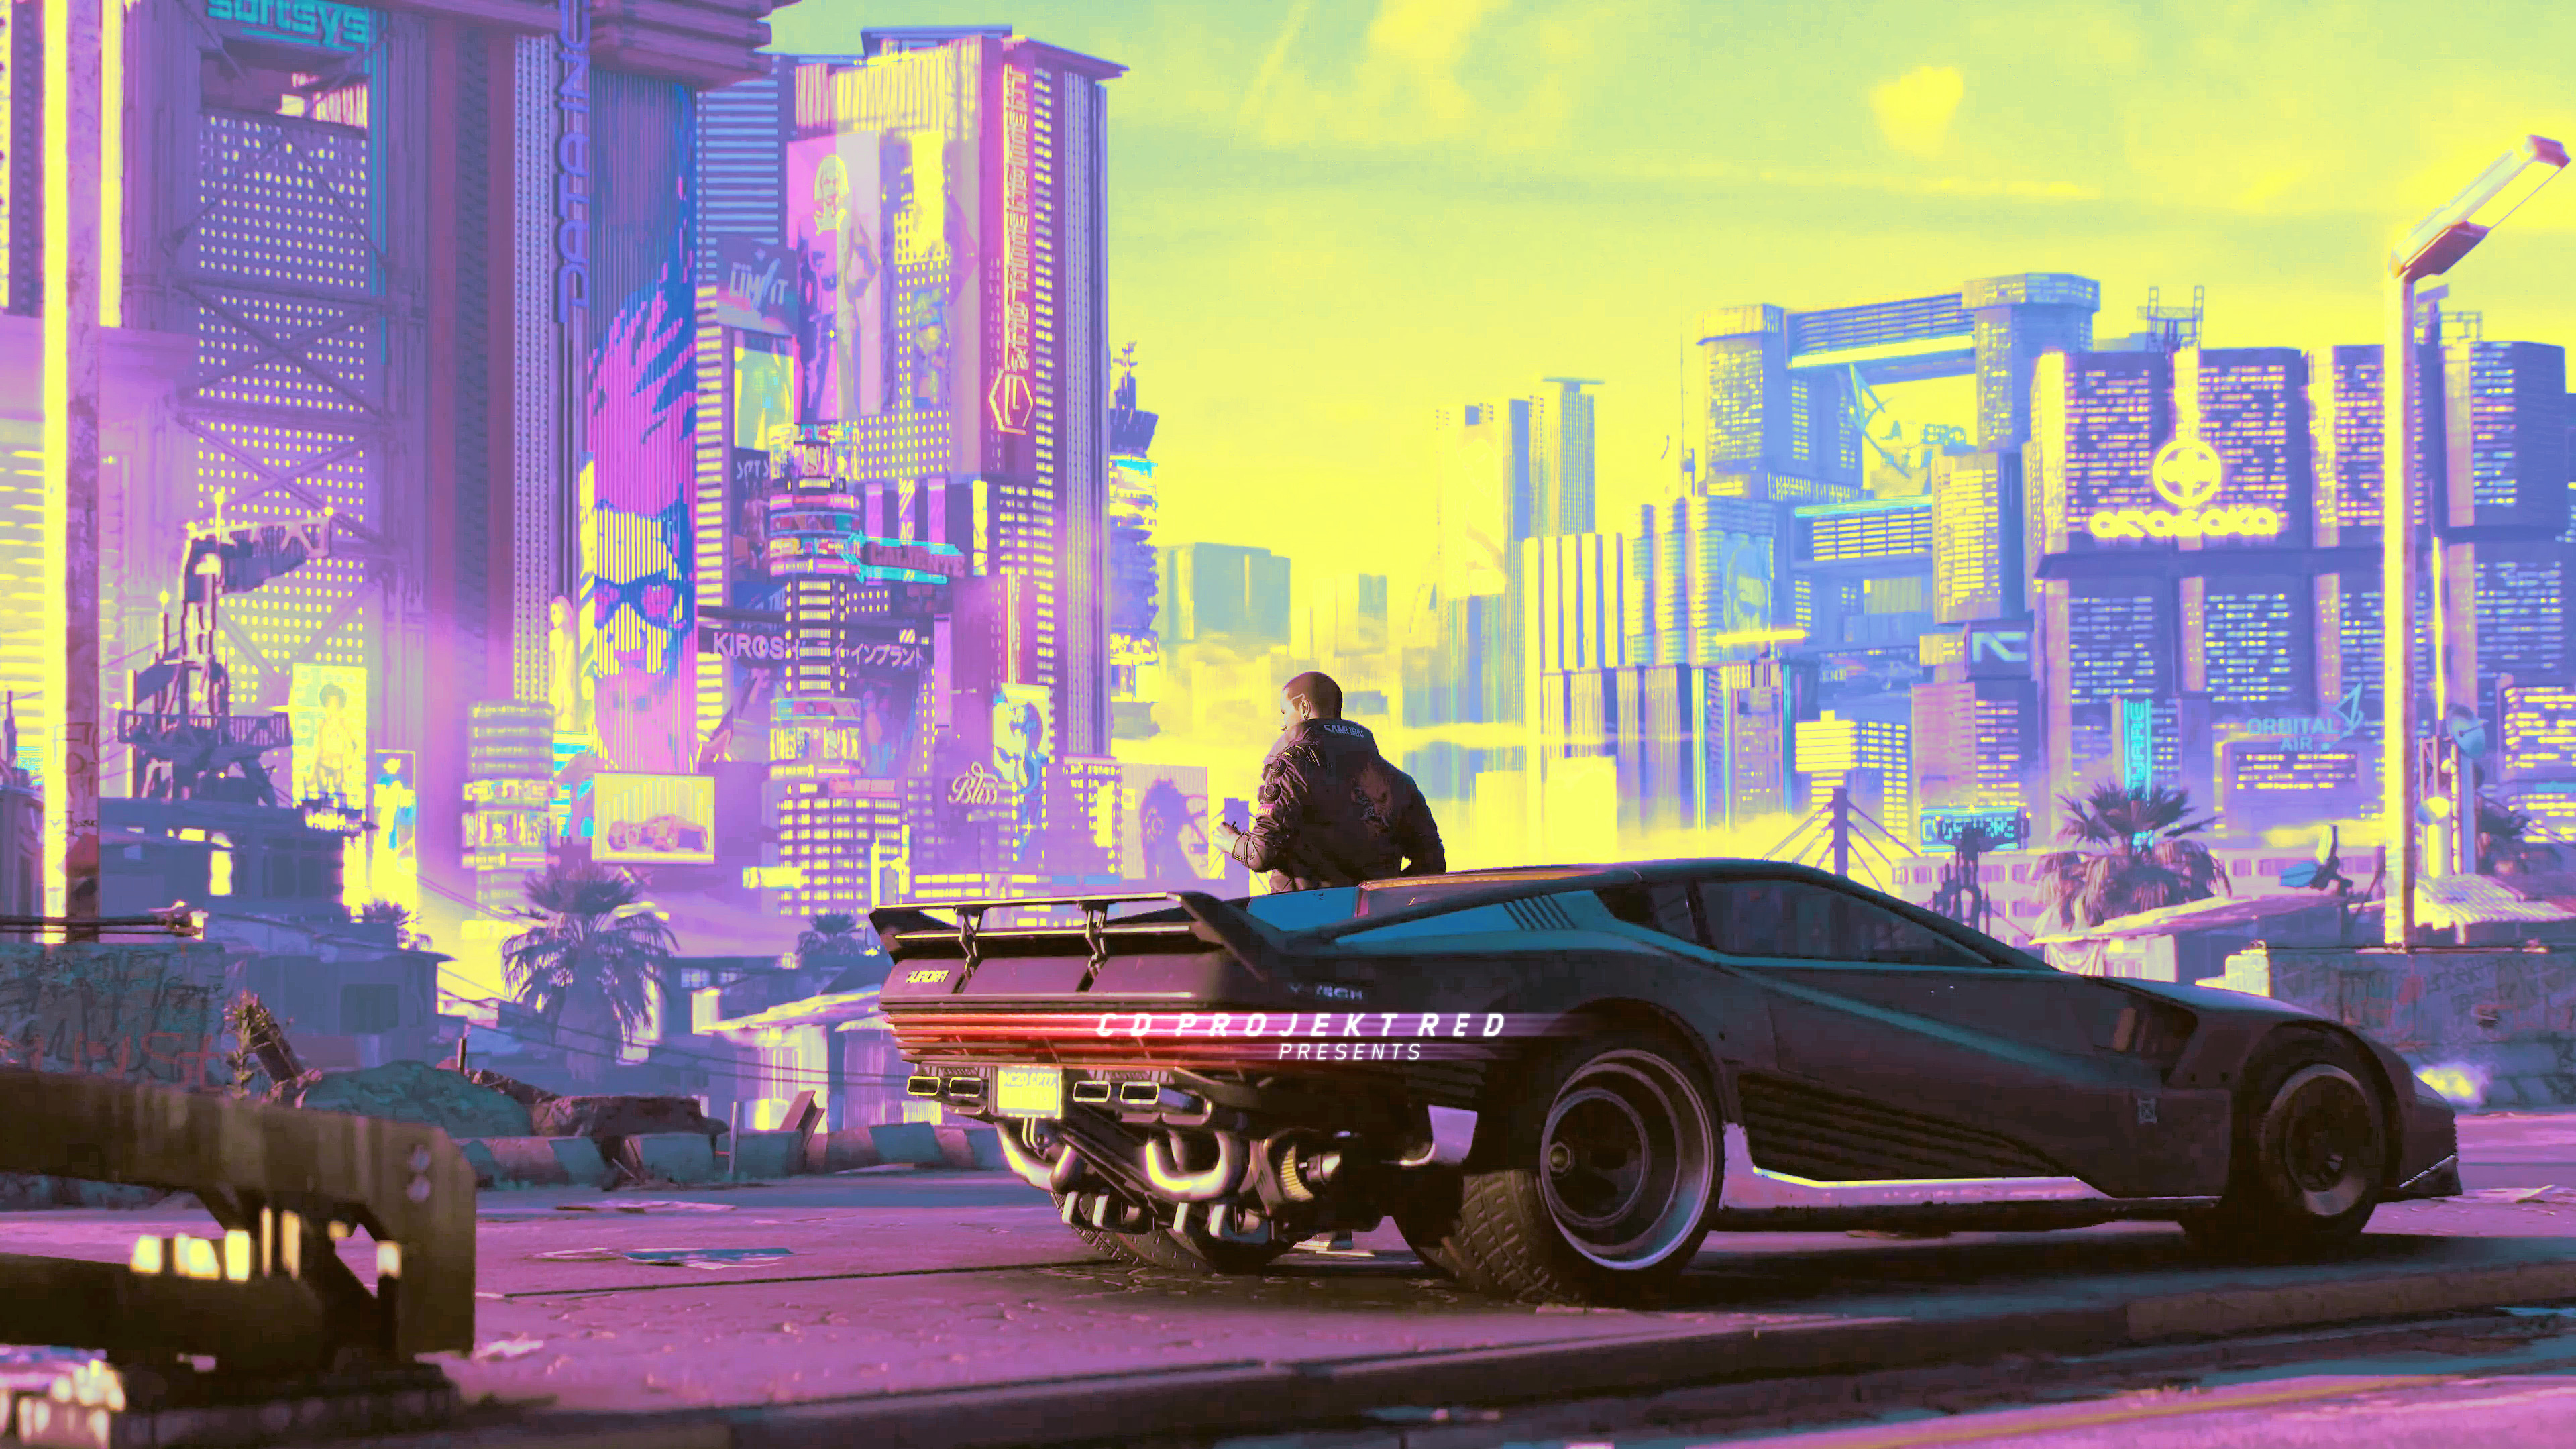 Cyberpunk 2077 Artistic 4k, HD Games, 4k Wallpapers ...